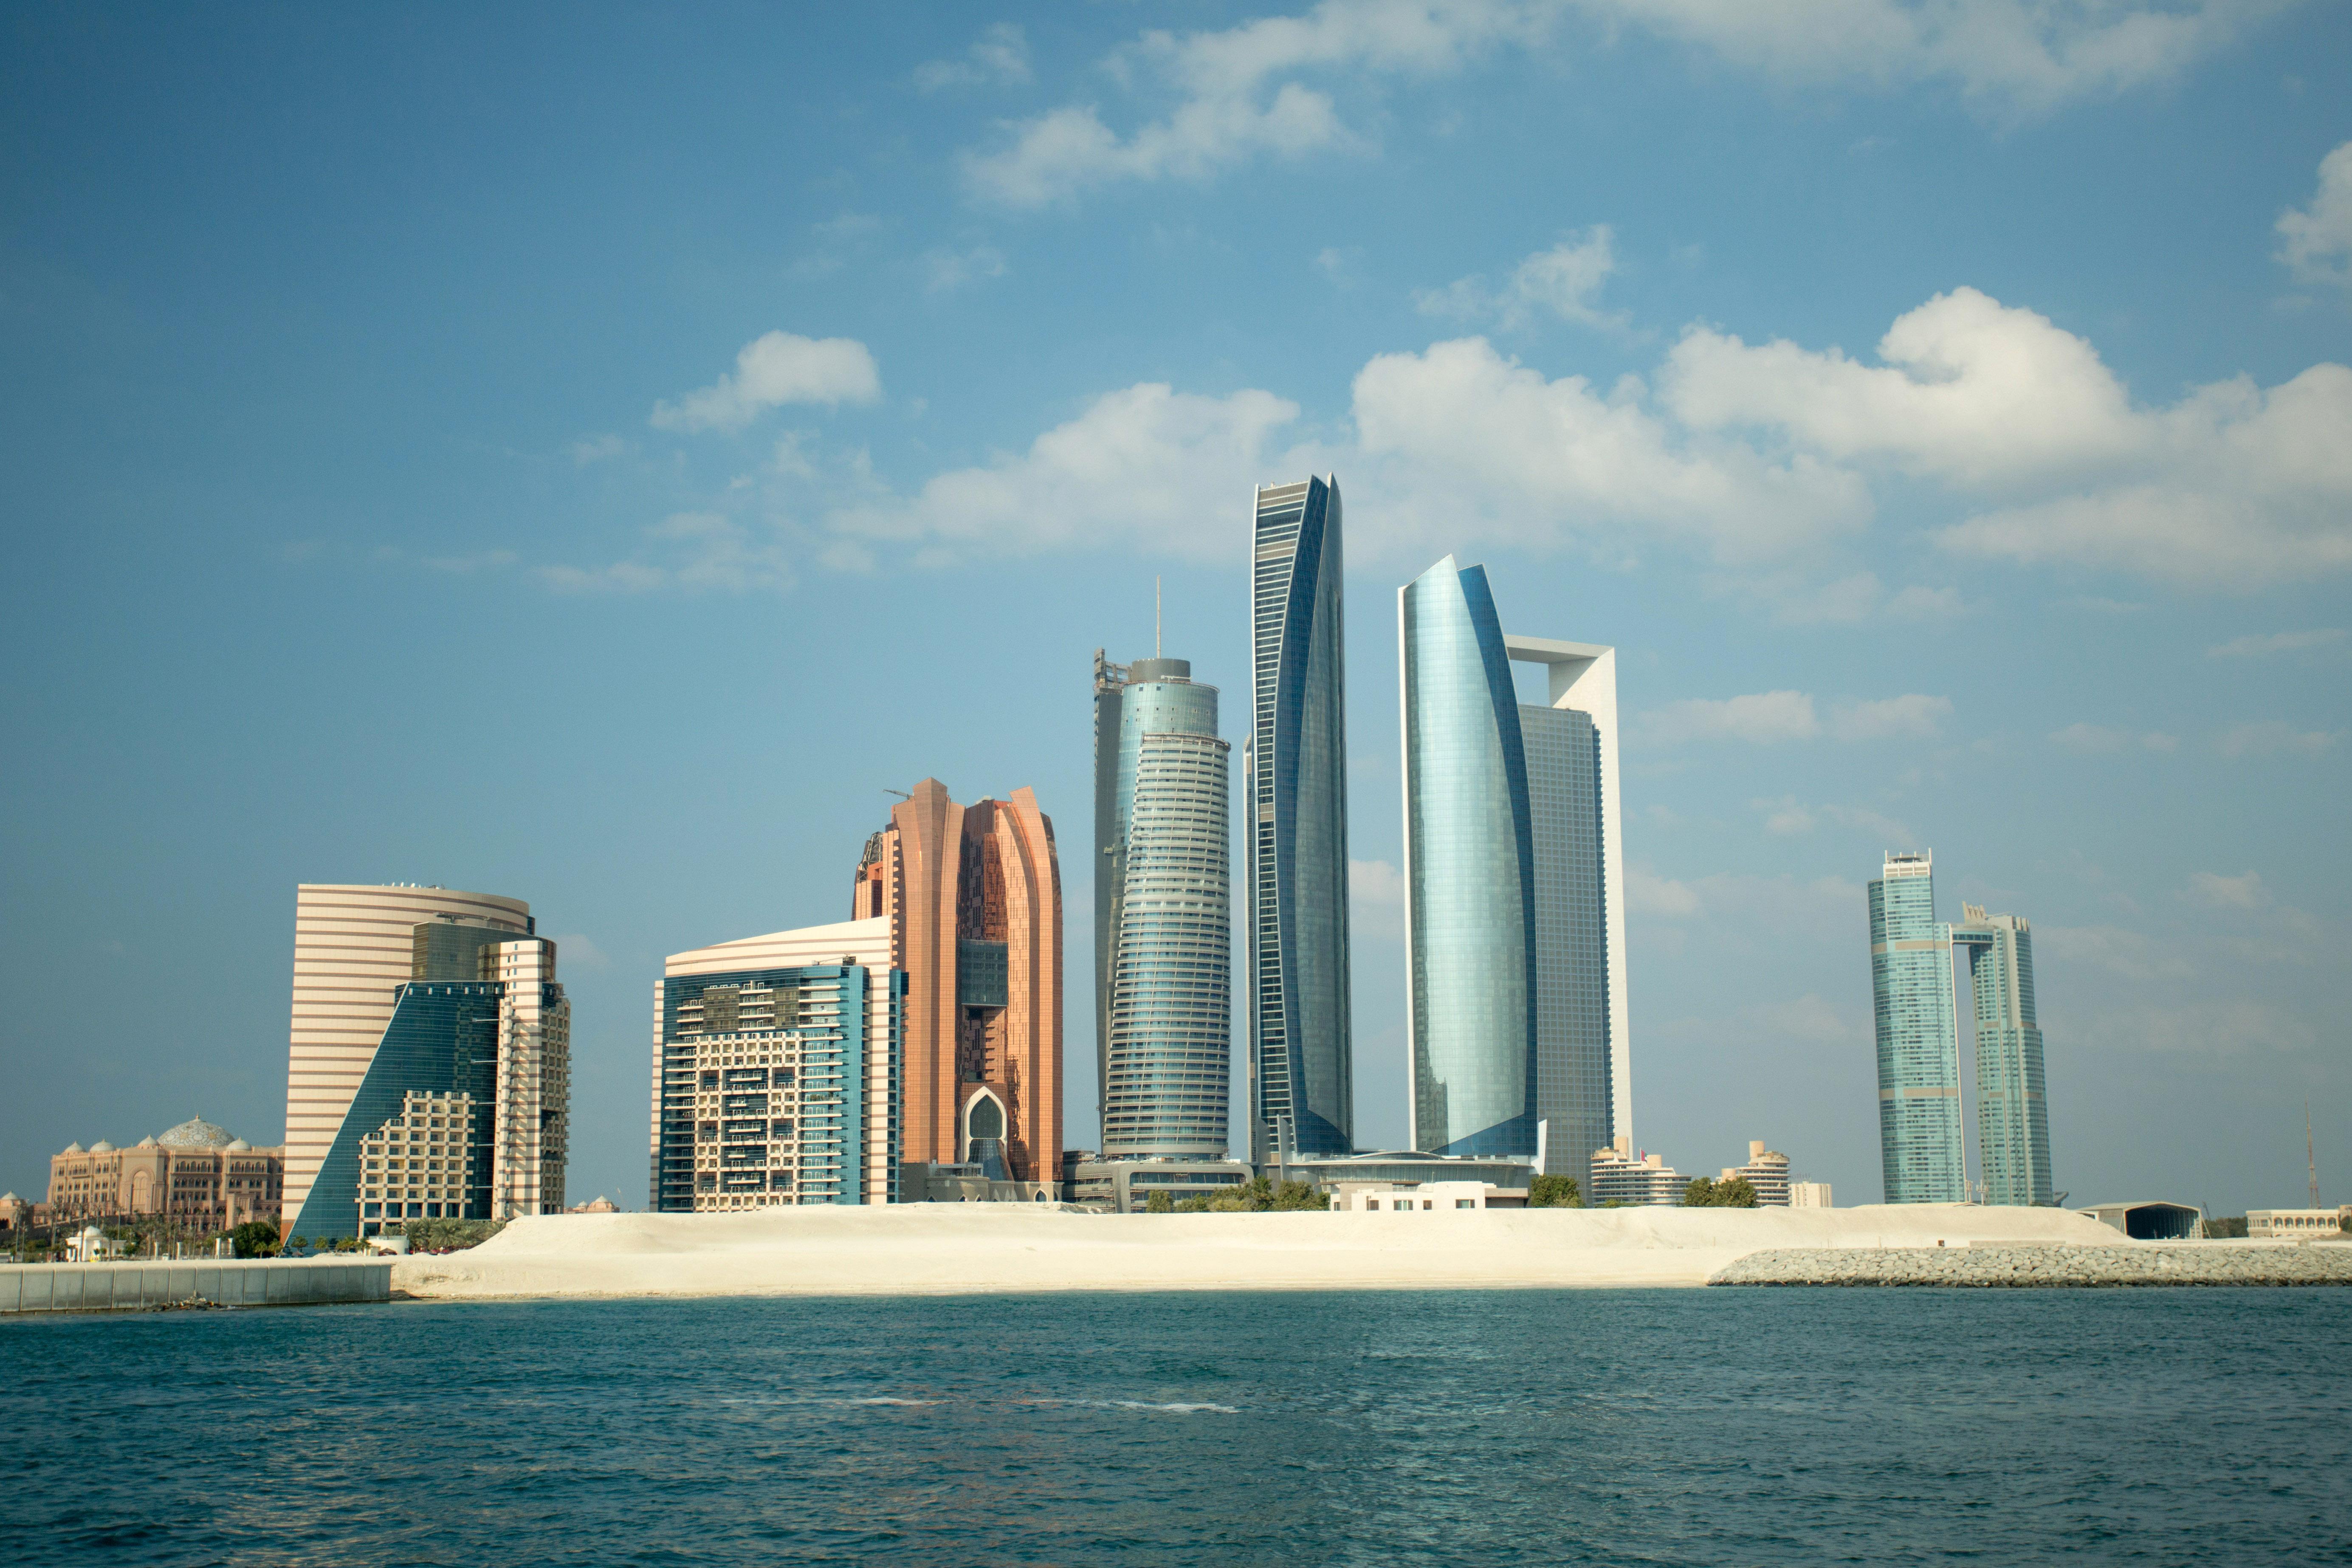 Etihad Towers Abu Dhabi, United Arab Emirates 5k Retina